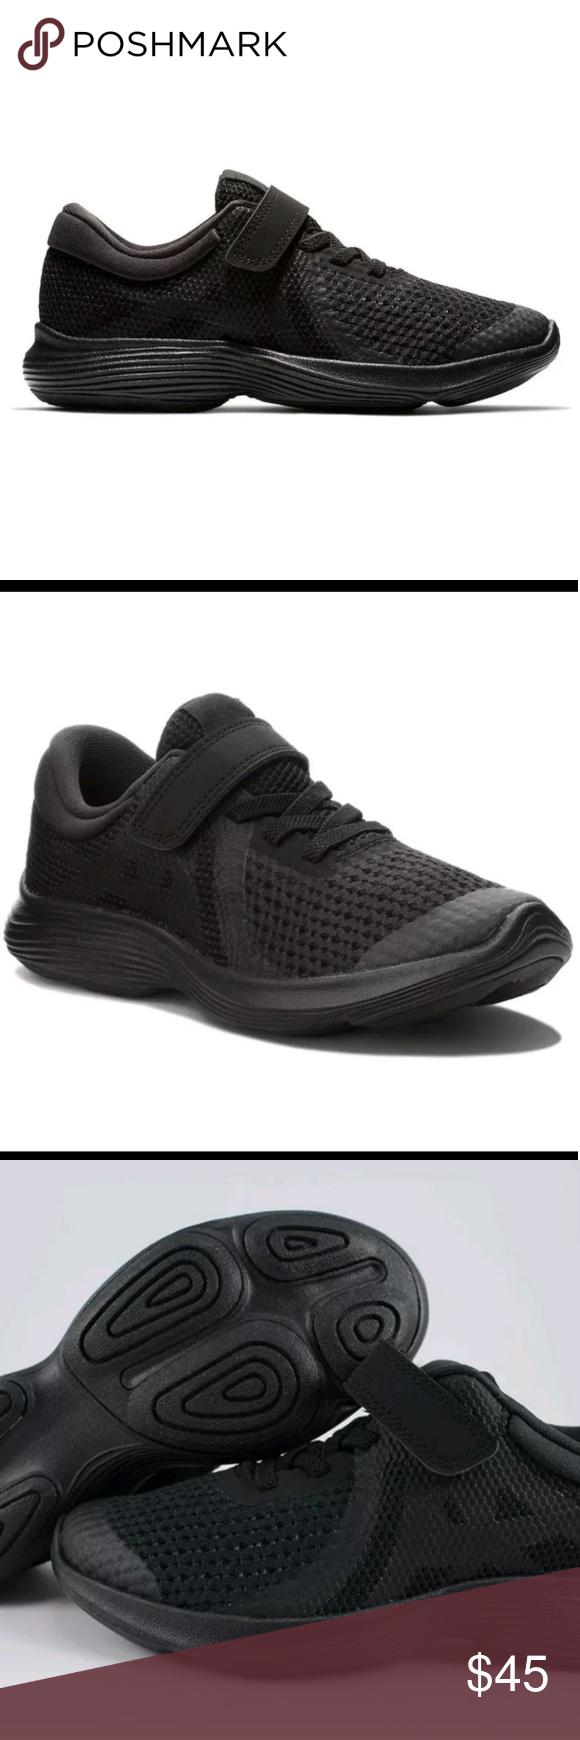 Nike Revolution 4 PSV 2 1 Boys Youth Kids Running Shoe Sneakers 11 13 3